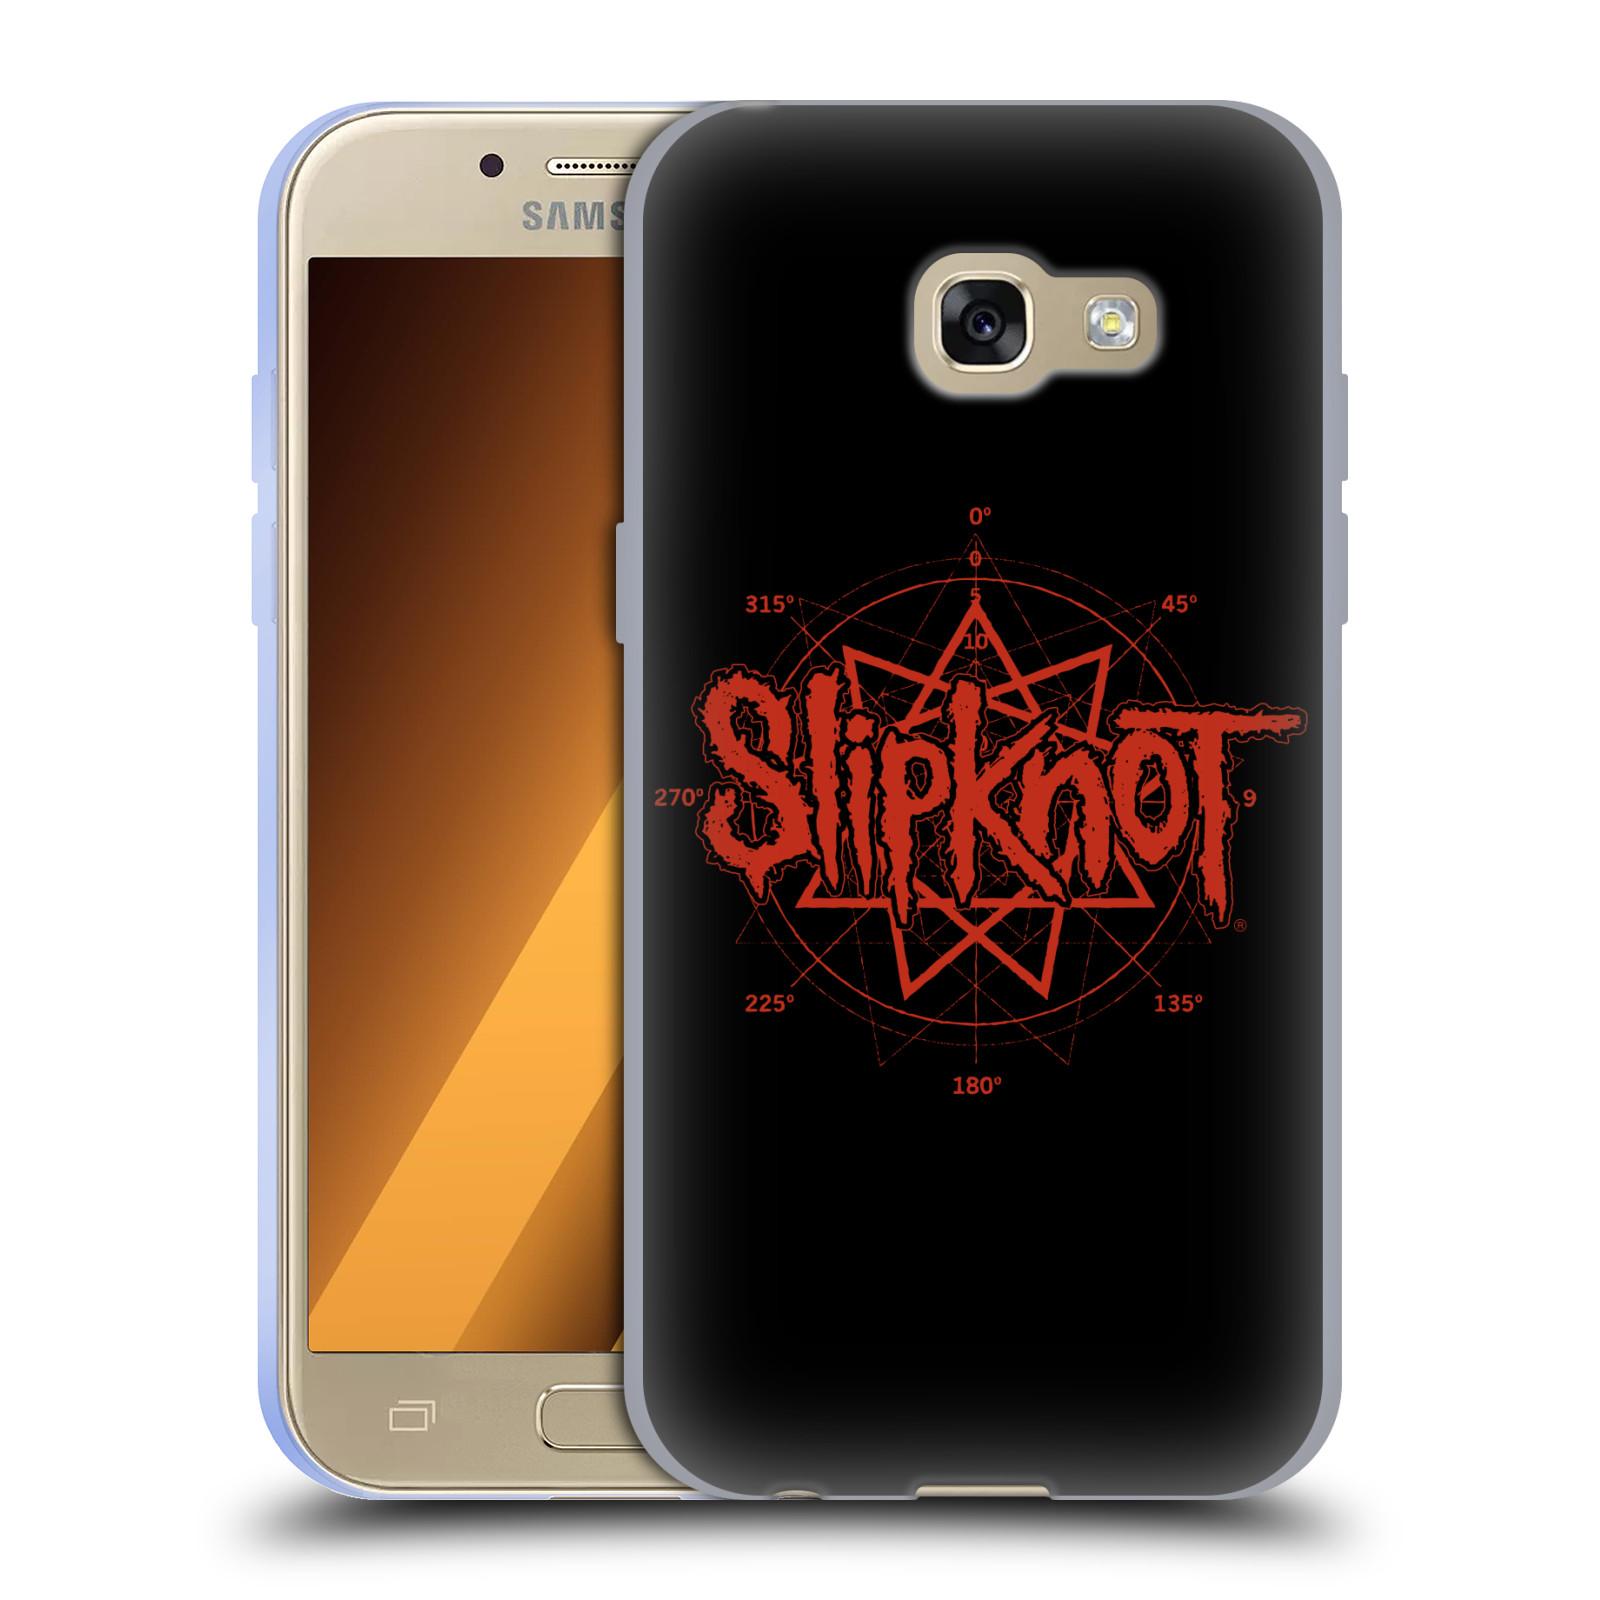 HEAD CASE silikonový obal na mobil Samsung Galaxy A3 2017 (A320) hudební skupina Slipknot logo